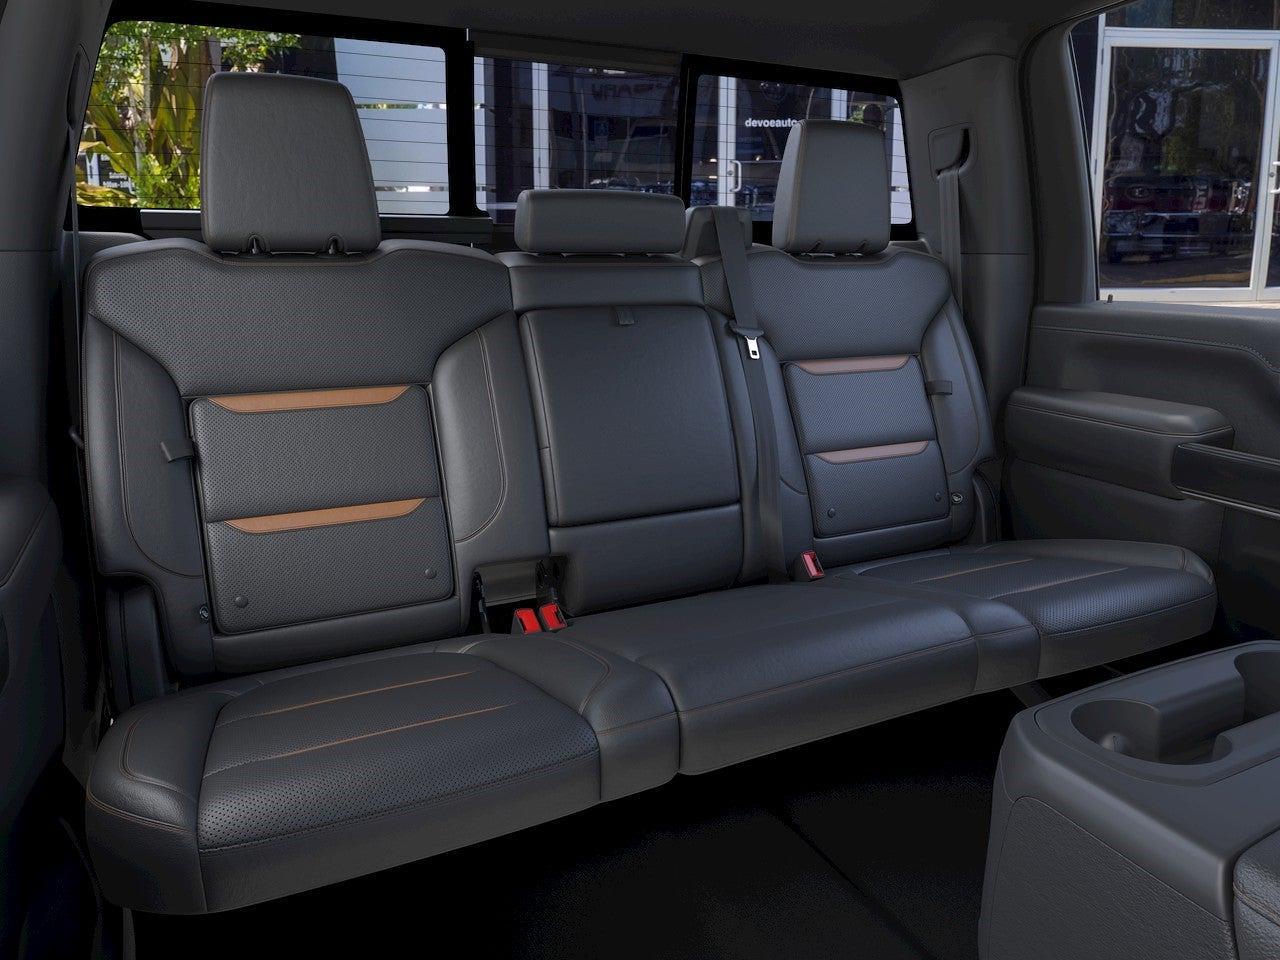 2021 GMC Sierra 2500 Crew Cab 4x4, Pickup #T21313 - photo 33